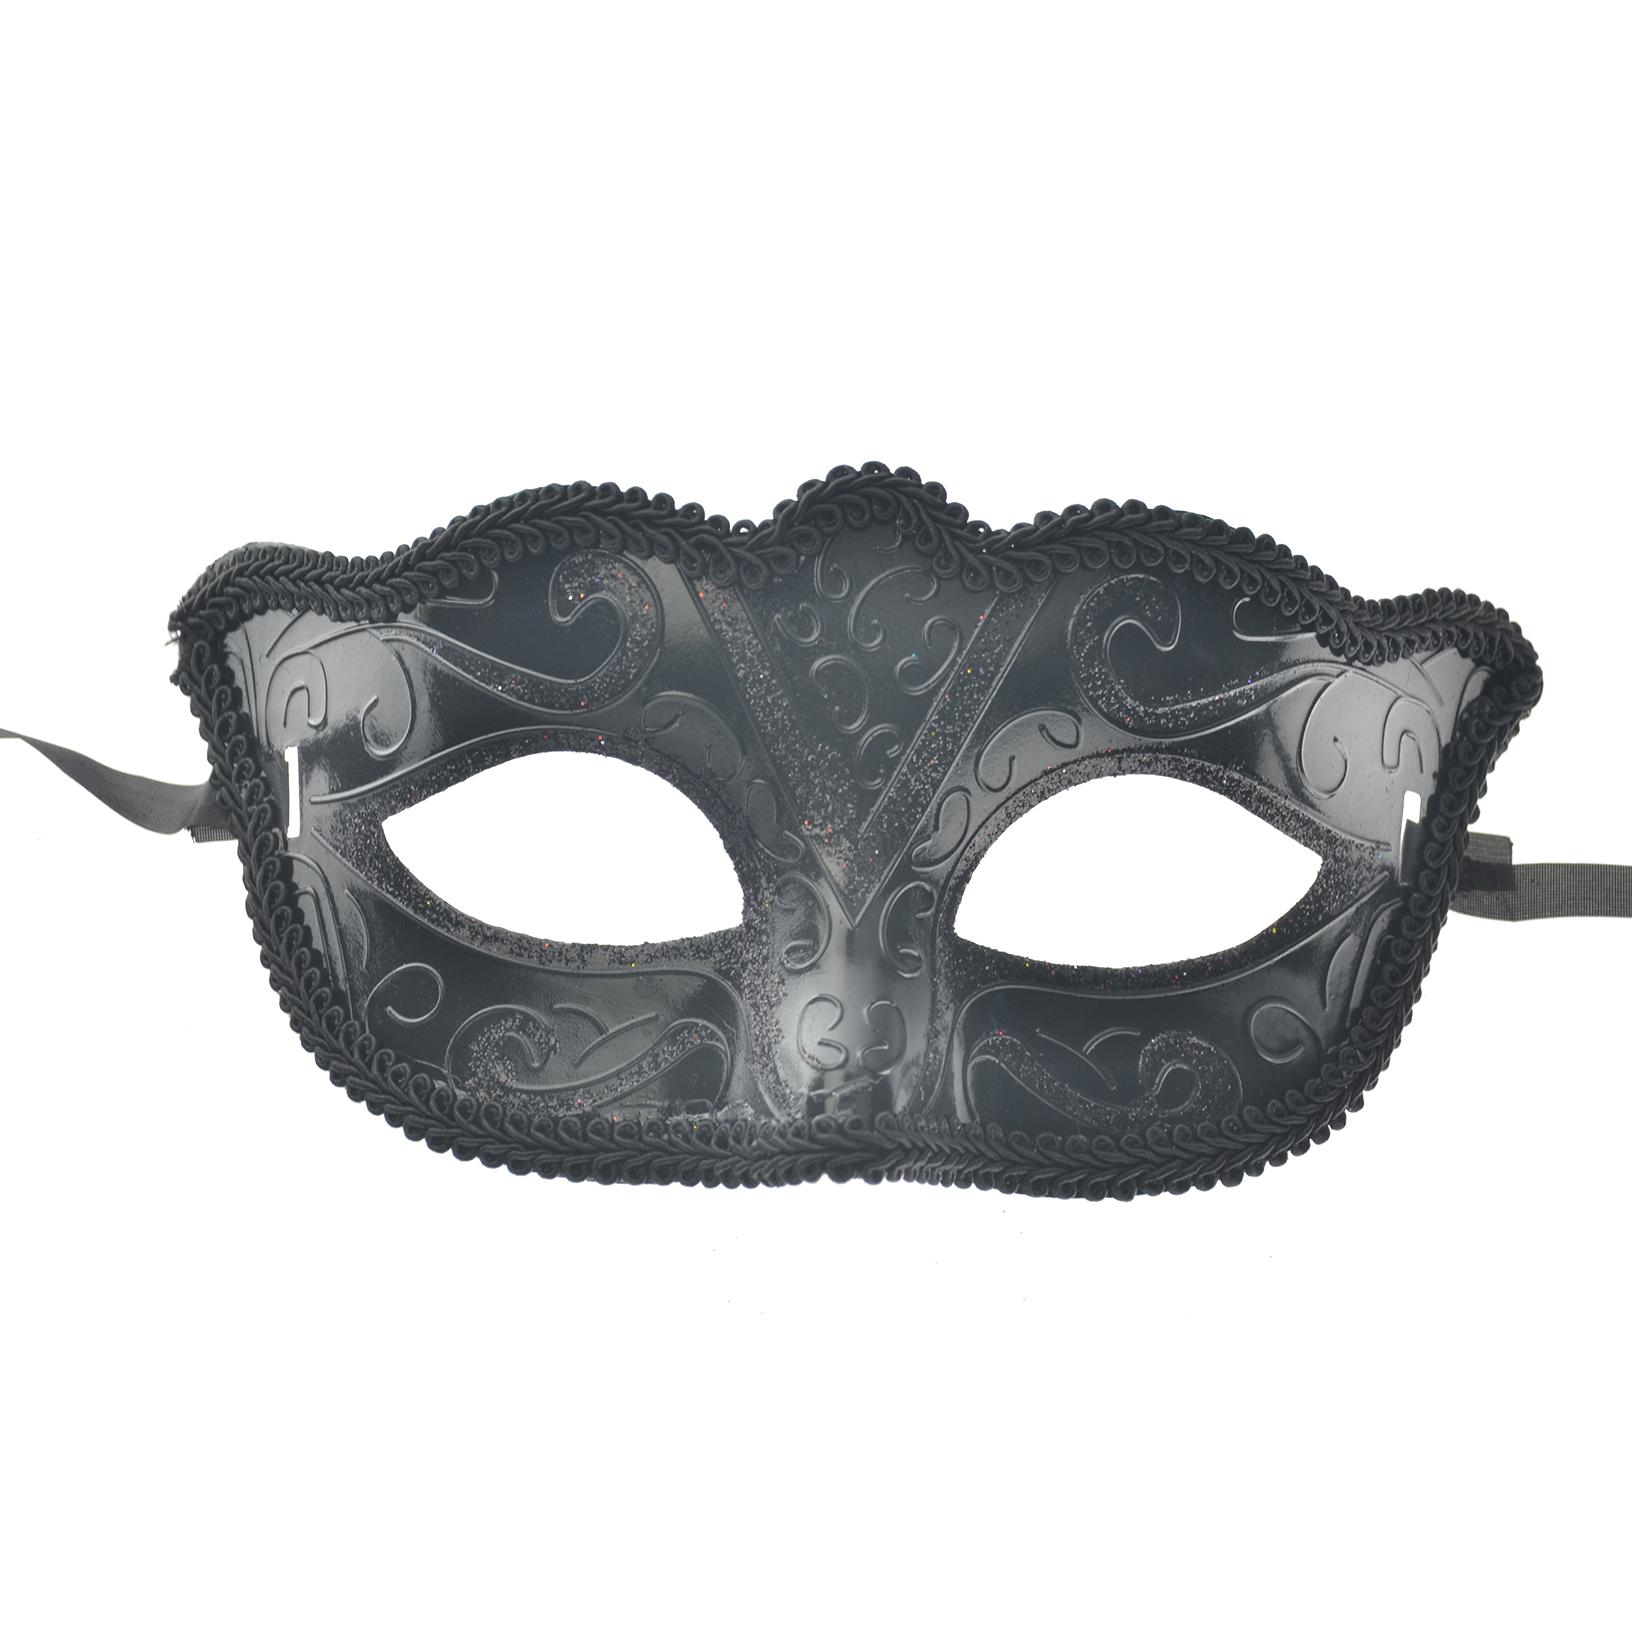 184bdca88d4f Details about Women Men Black Venetian Masquerade Tiara Eye Mask Party Fancy  Dress Costume